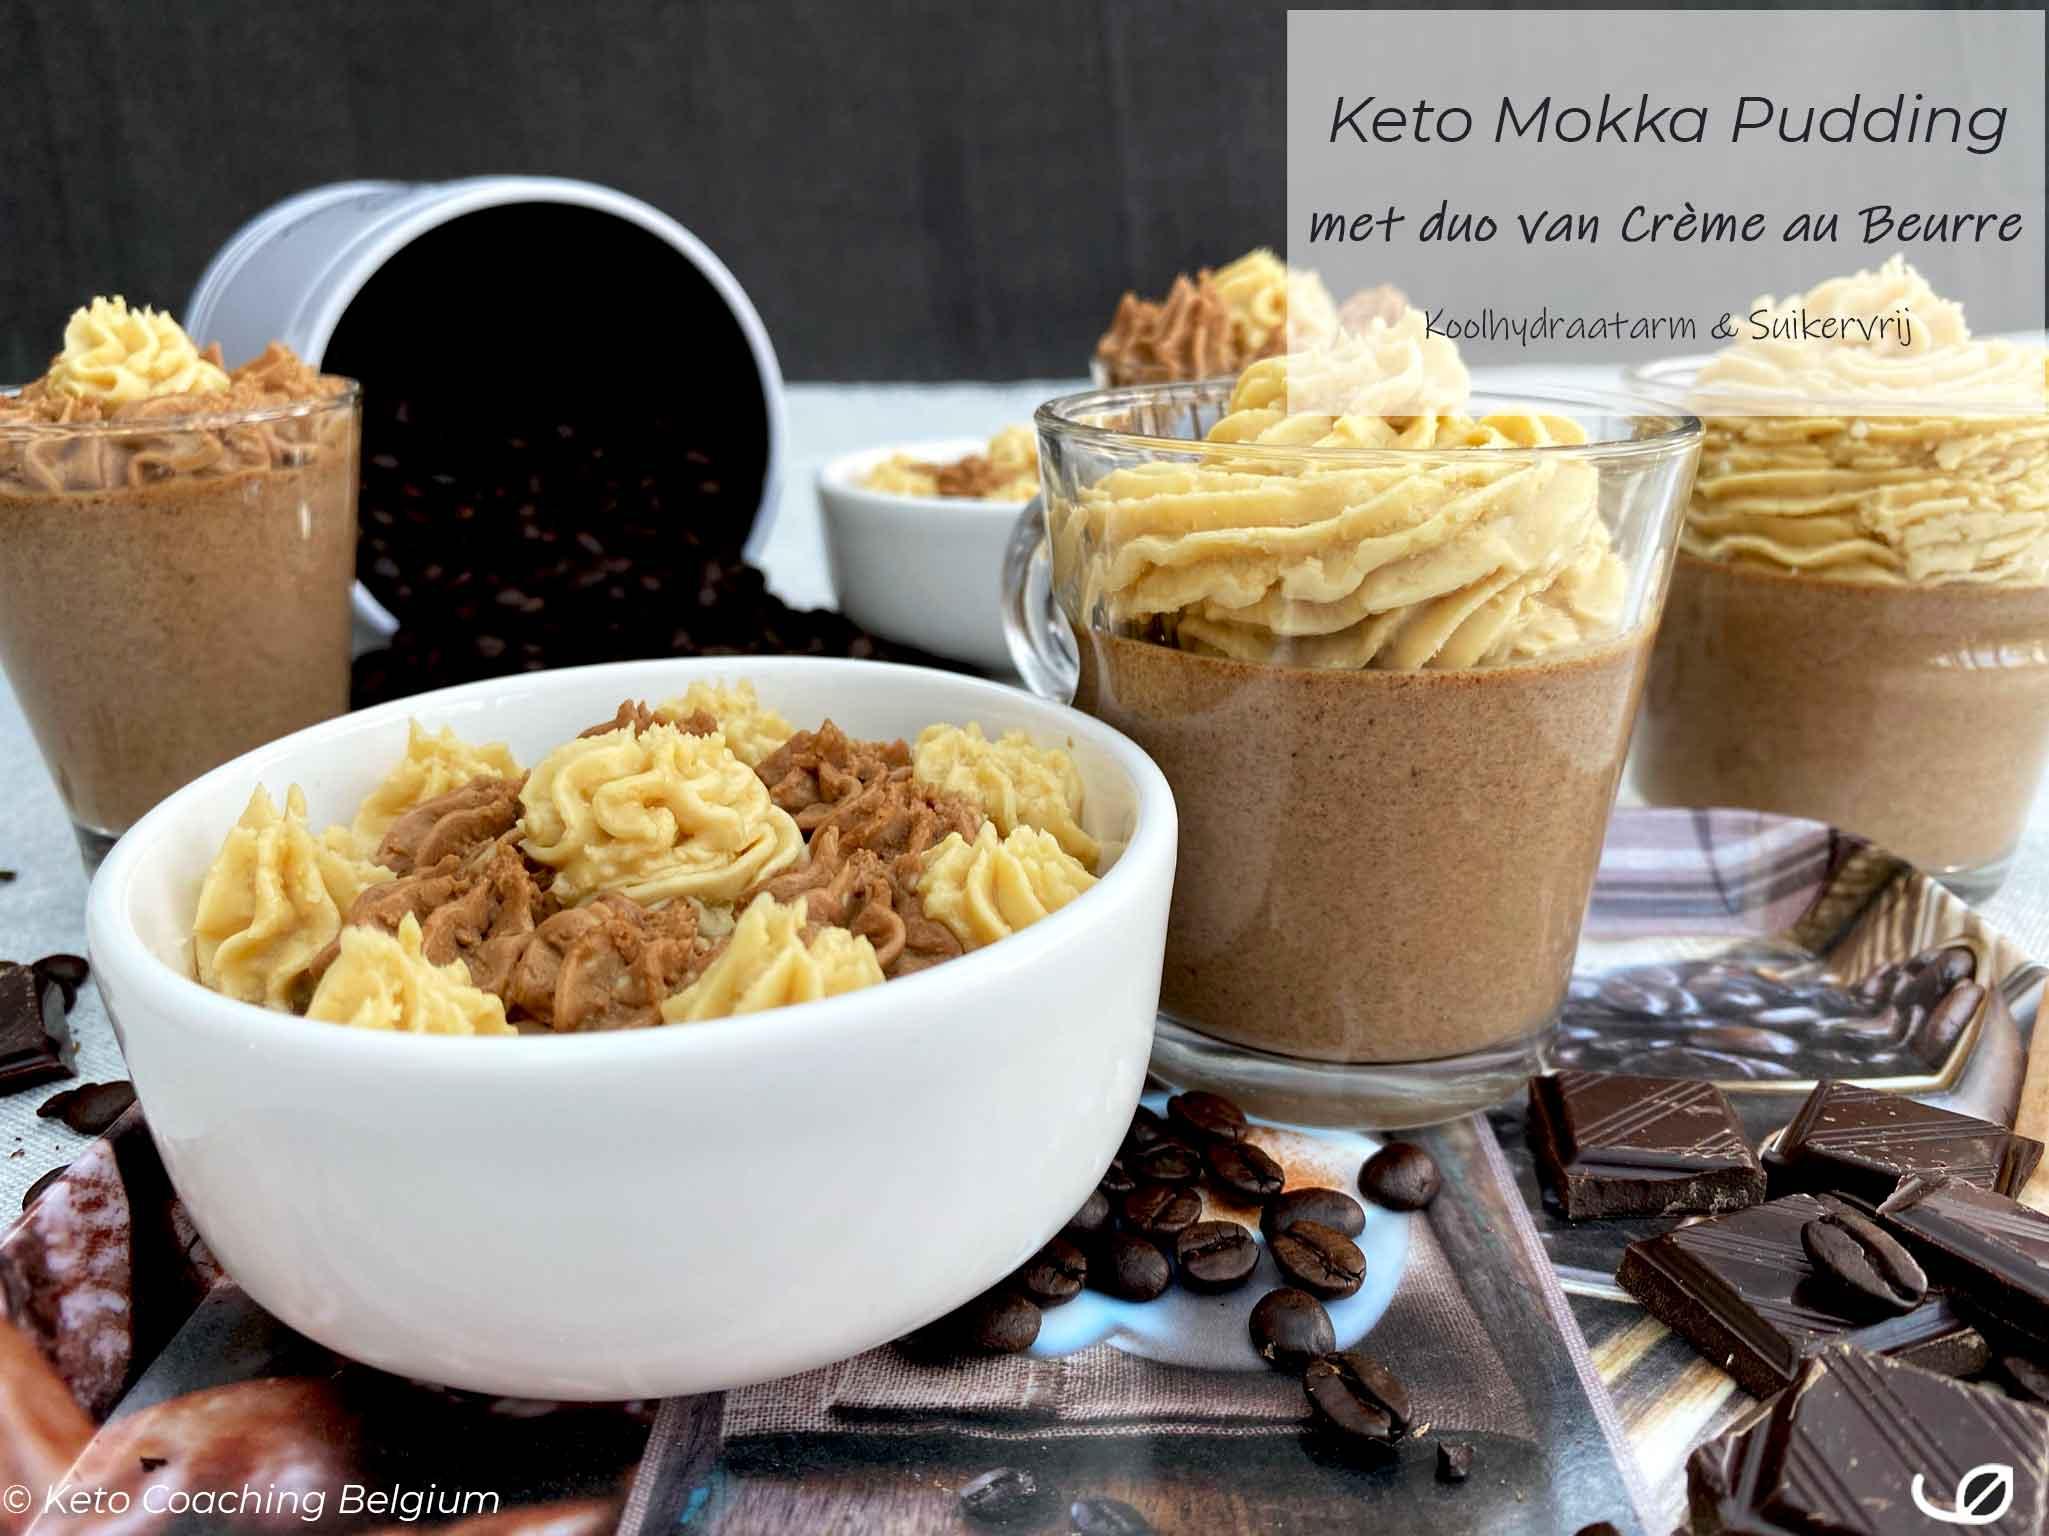 Keto mokka chocolade mousse pudding met duo van mokka en chocolade crème au beurre